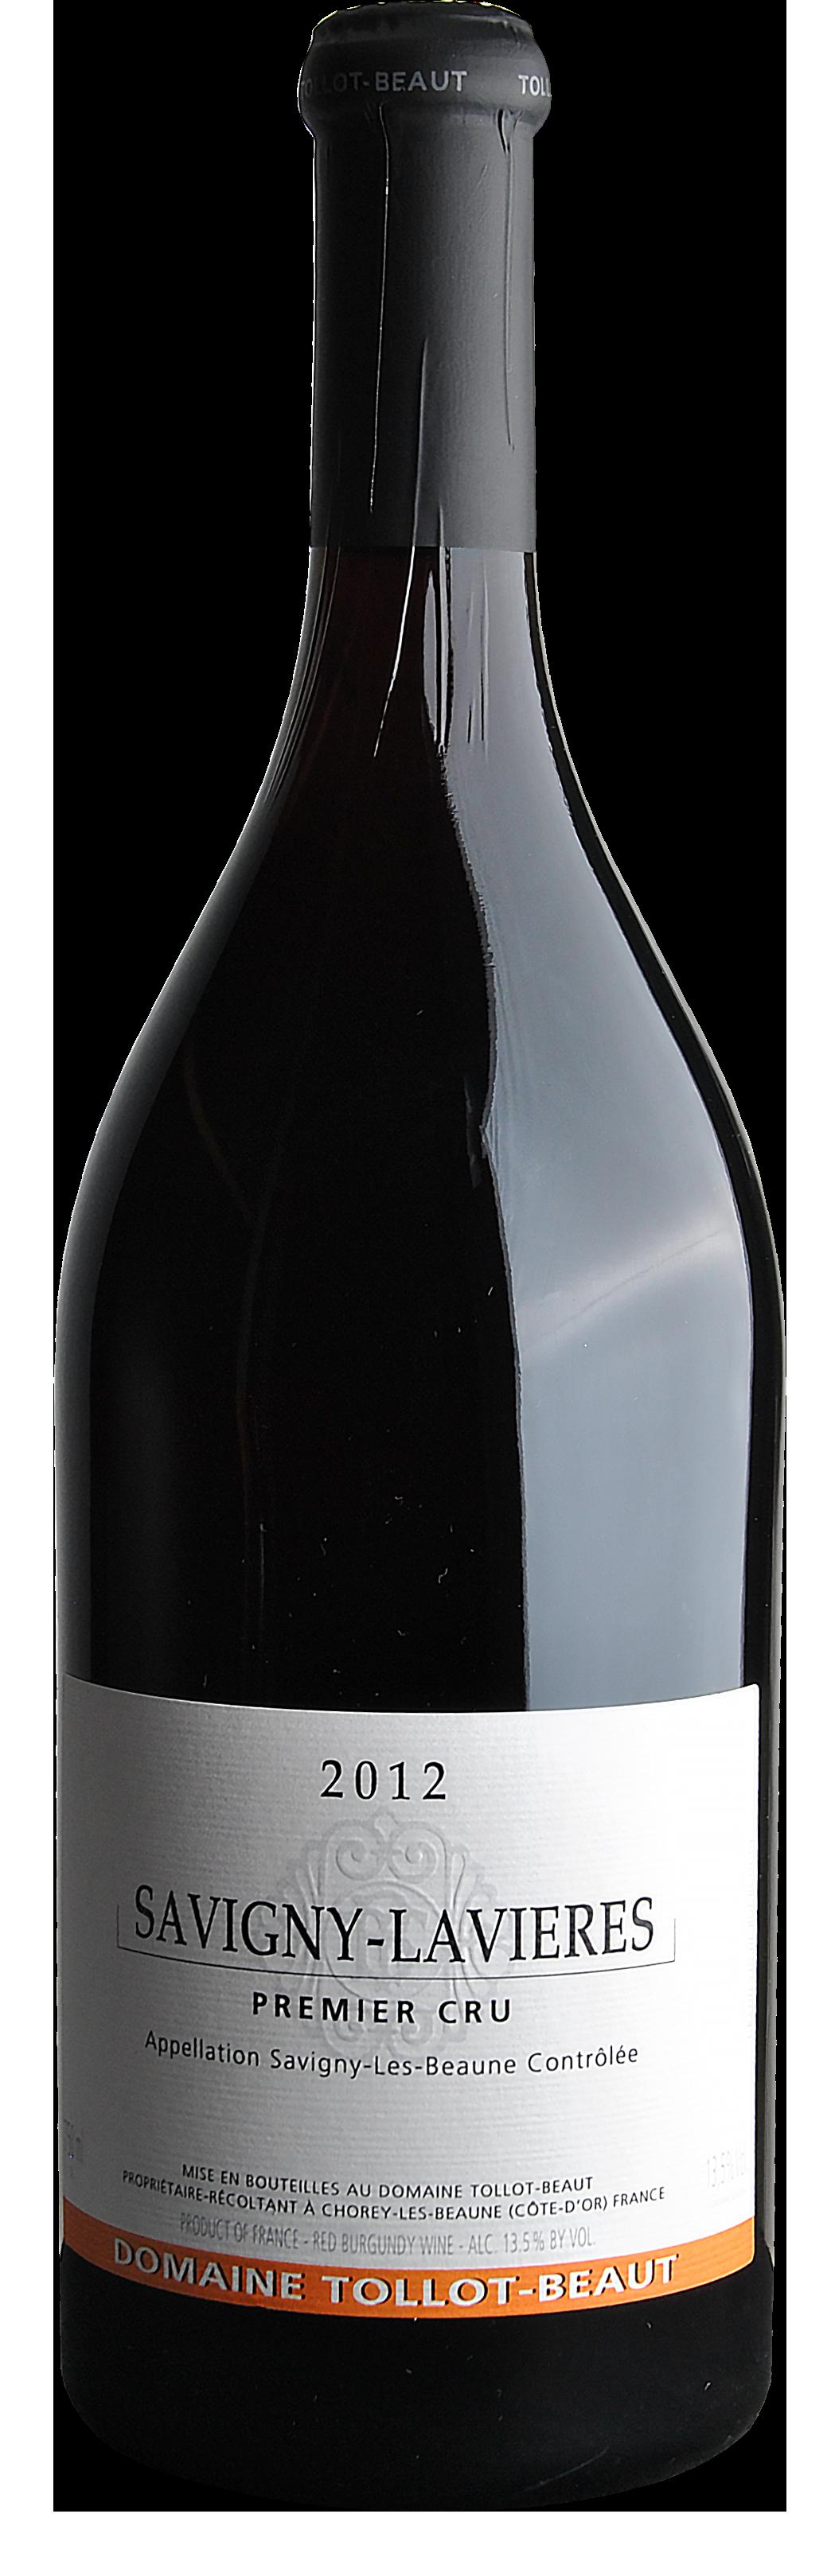 Savigny-Lavières 1er Cru- Domaine Tollot-Beaut - Vins Pirard